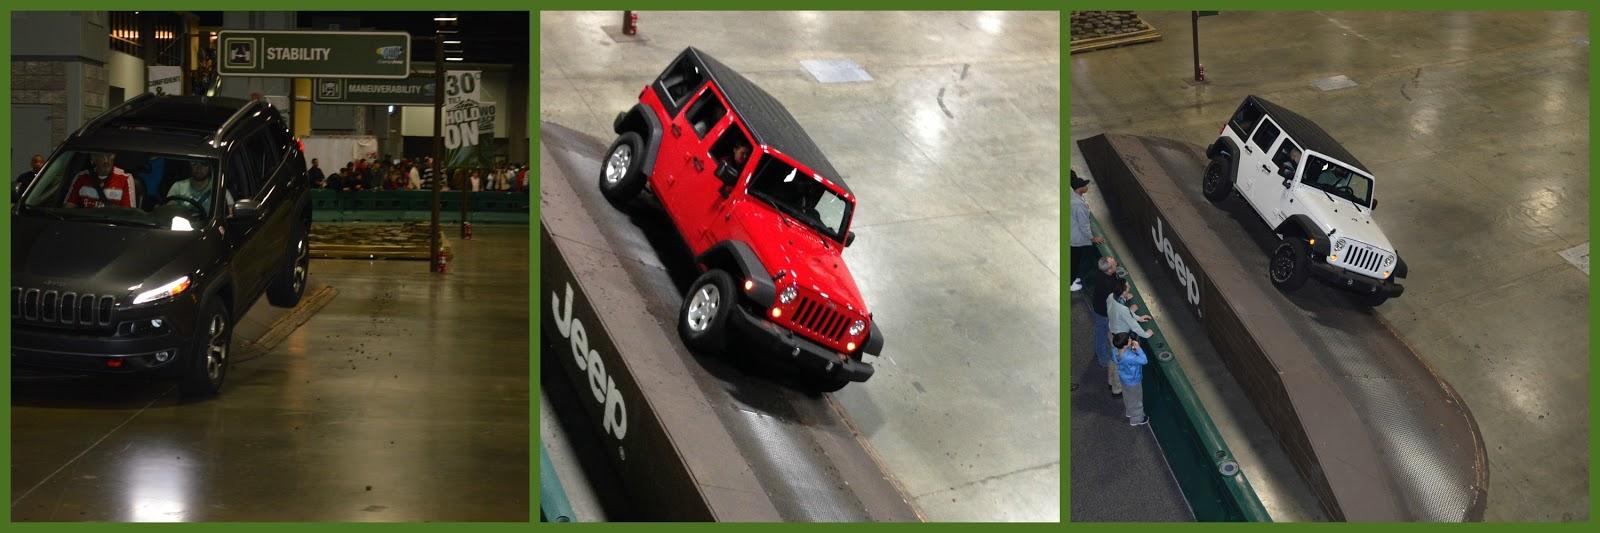 Jeep Momma - Blog: February 2015